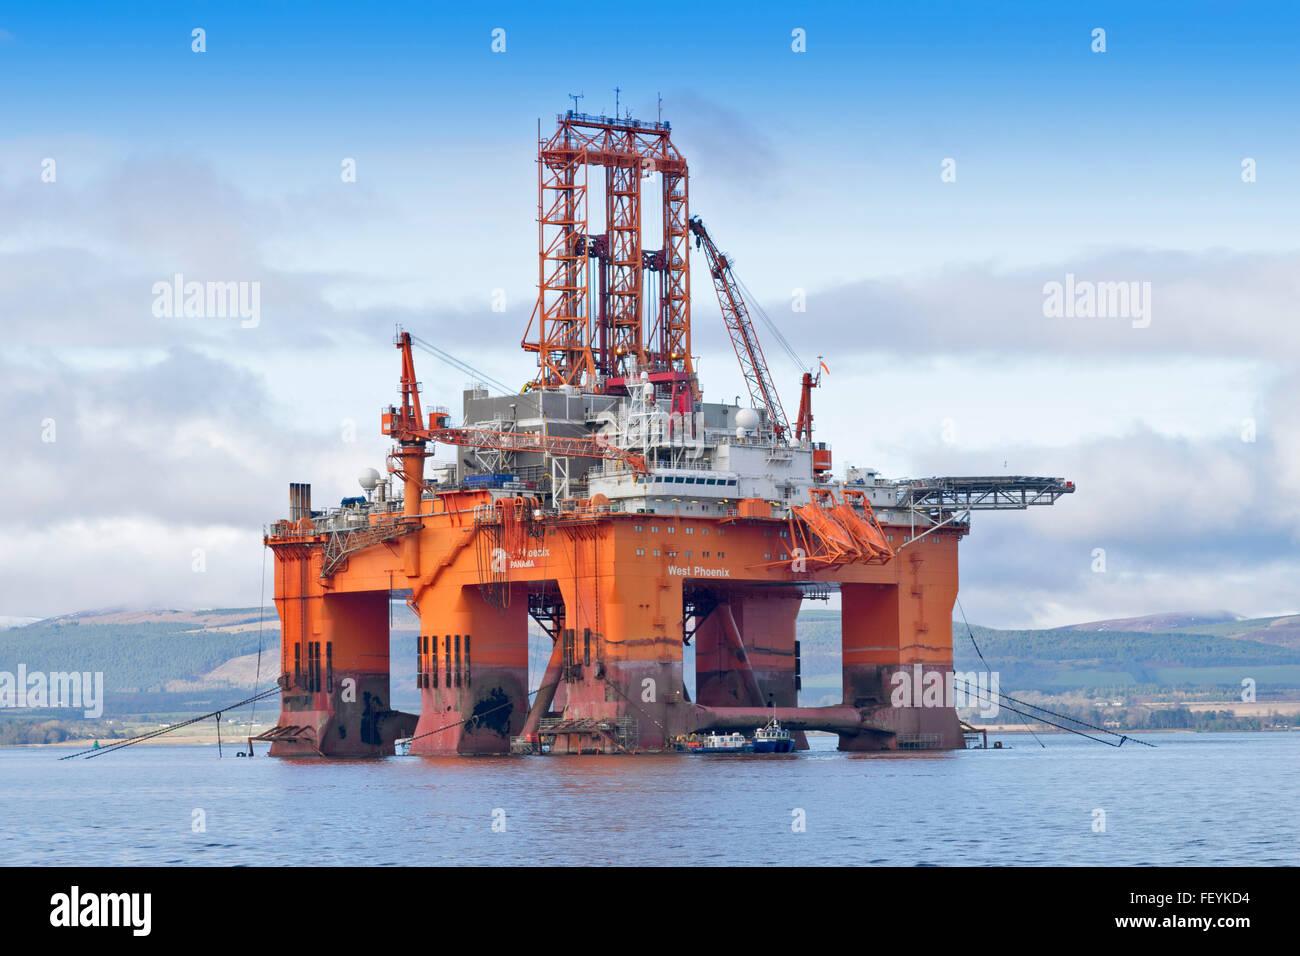 MASSIVE NORTH SEA OIL RIG WEST PHOENIX PANAMA ANCHORED IN THE CROMARTY FIRTH BLACK ISLE SCOTLAND - Stock Image